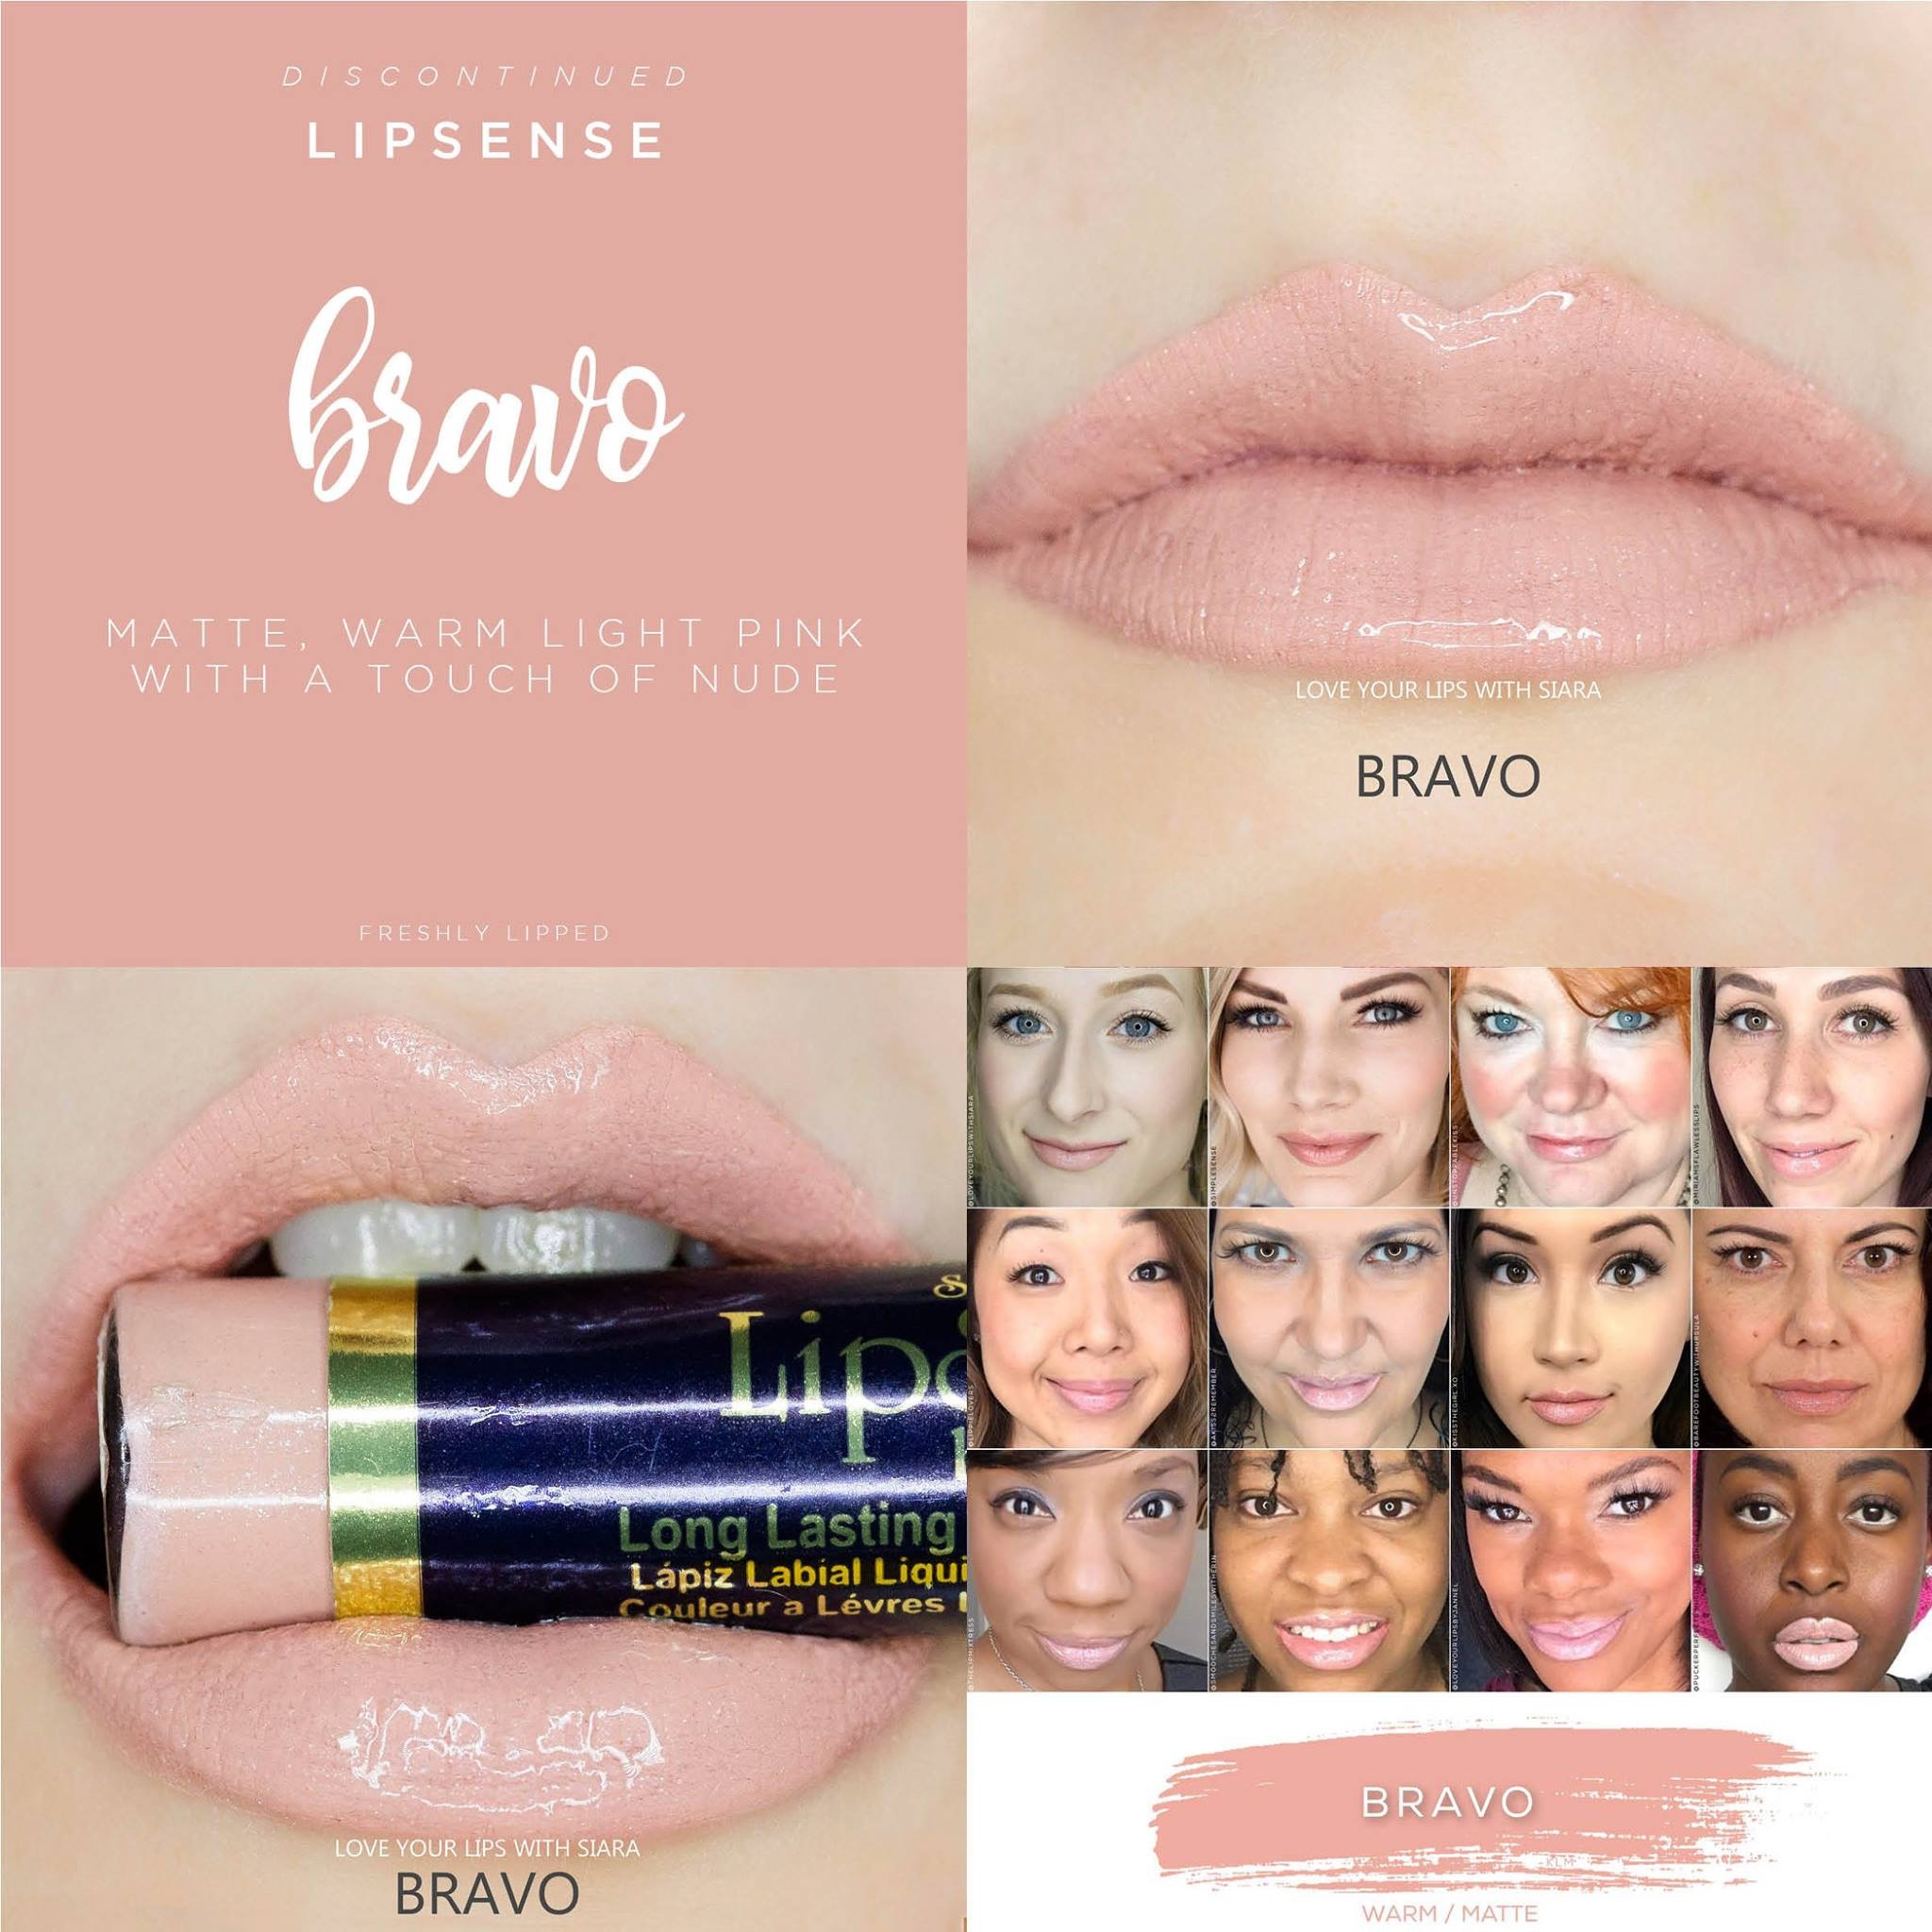 Bravo LipSense Collage